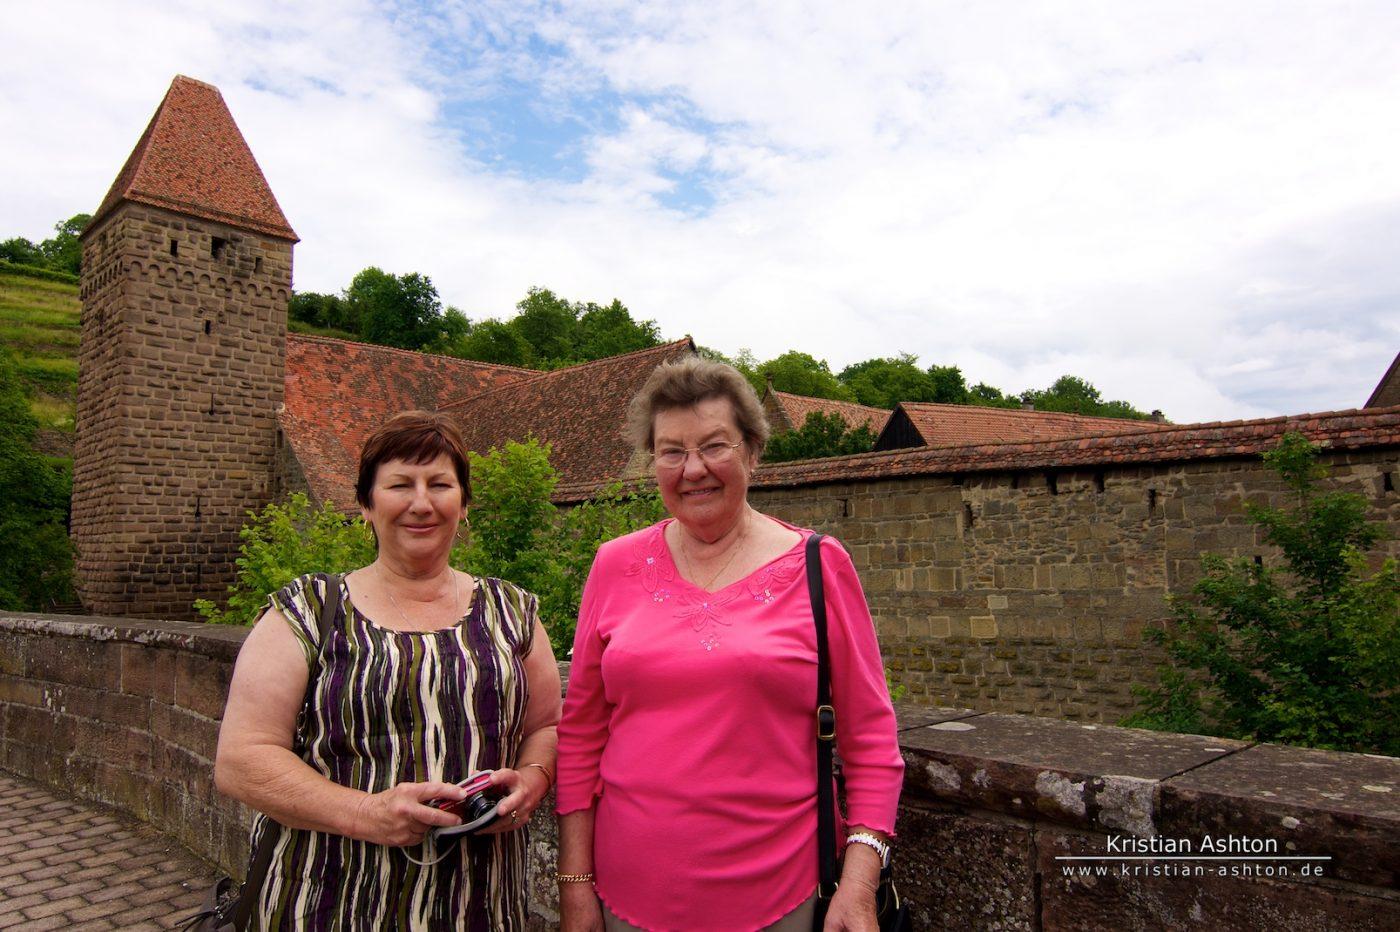 Mum and Omi at Maulbronn monestary